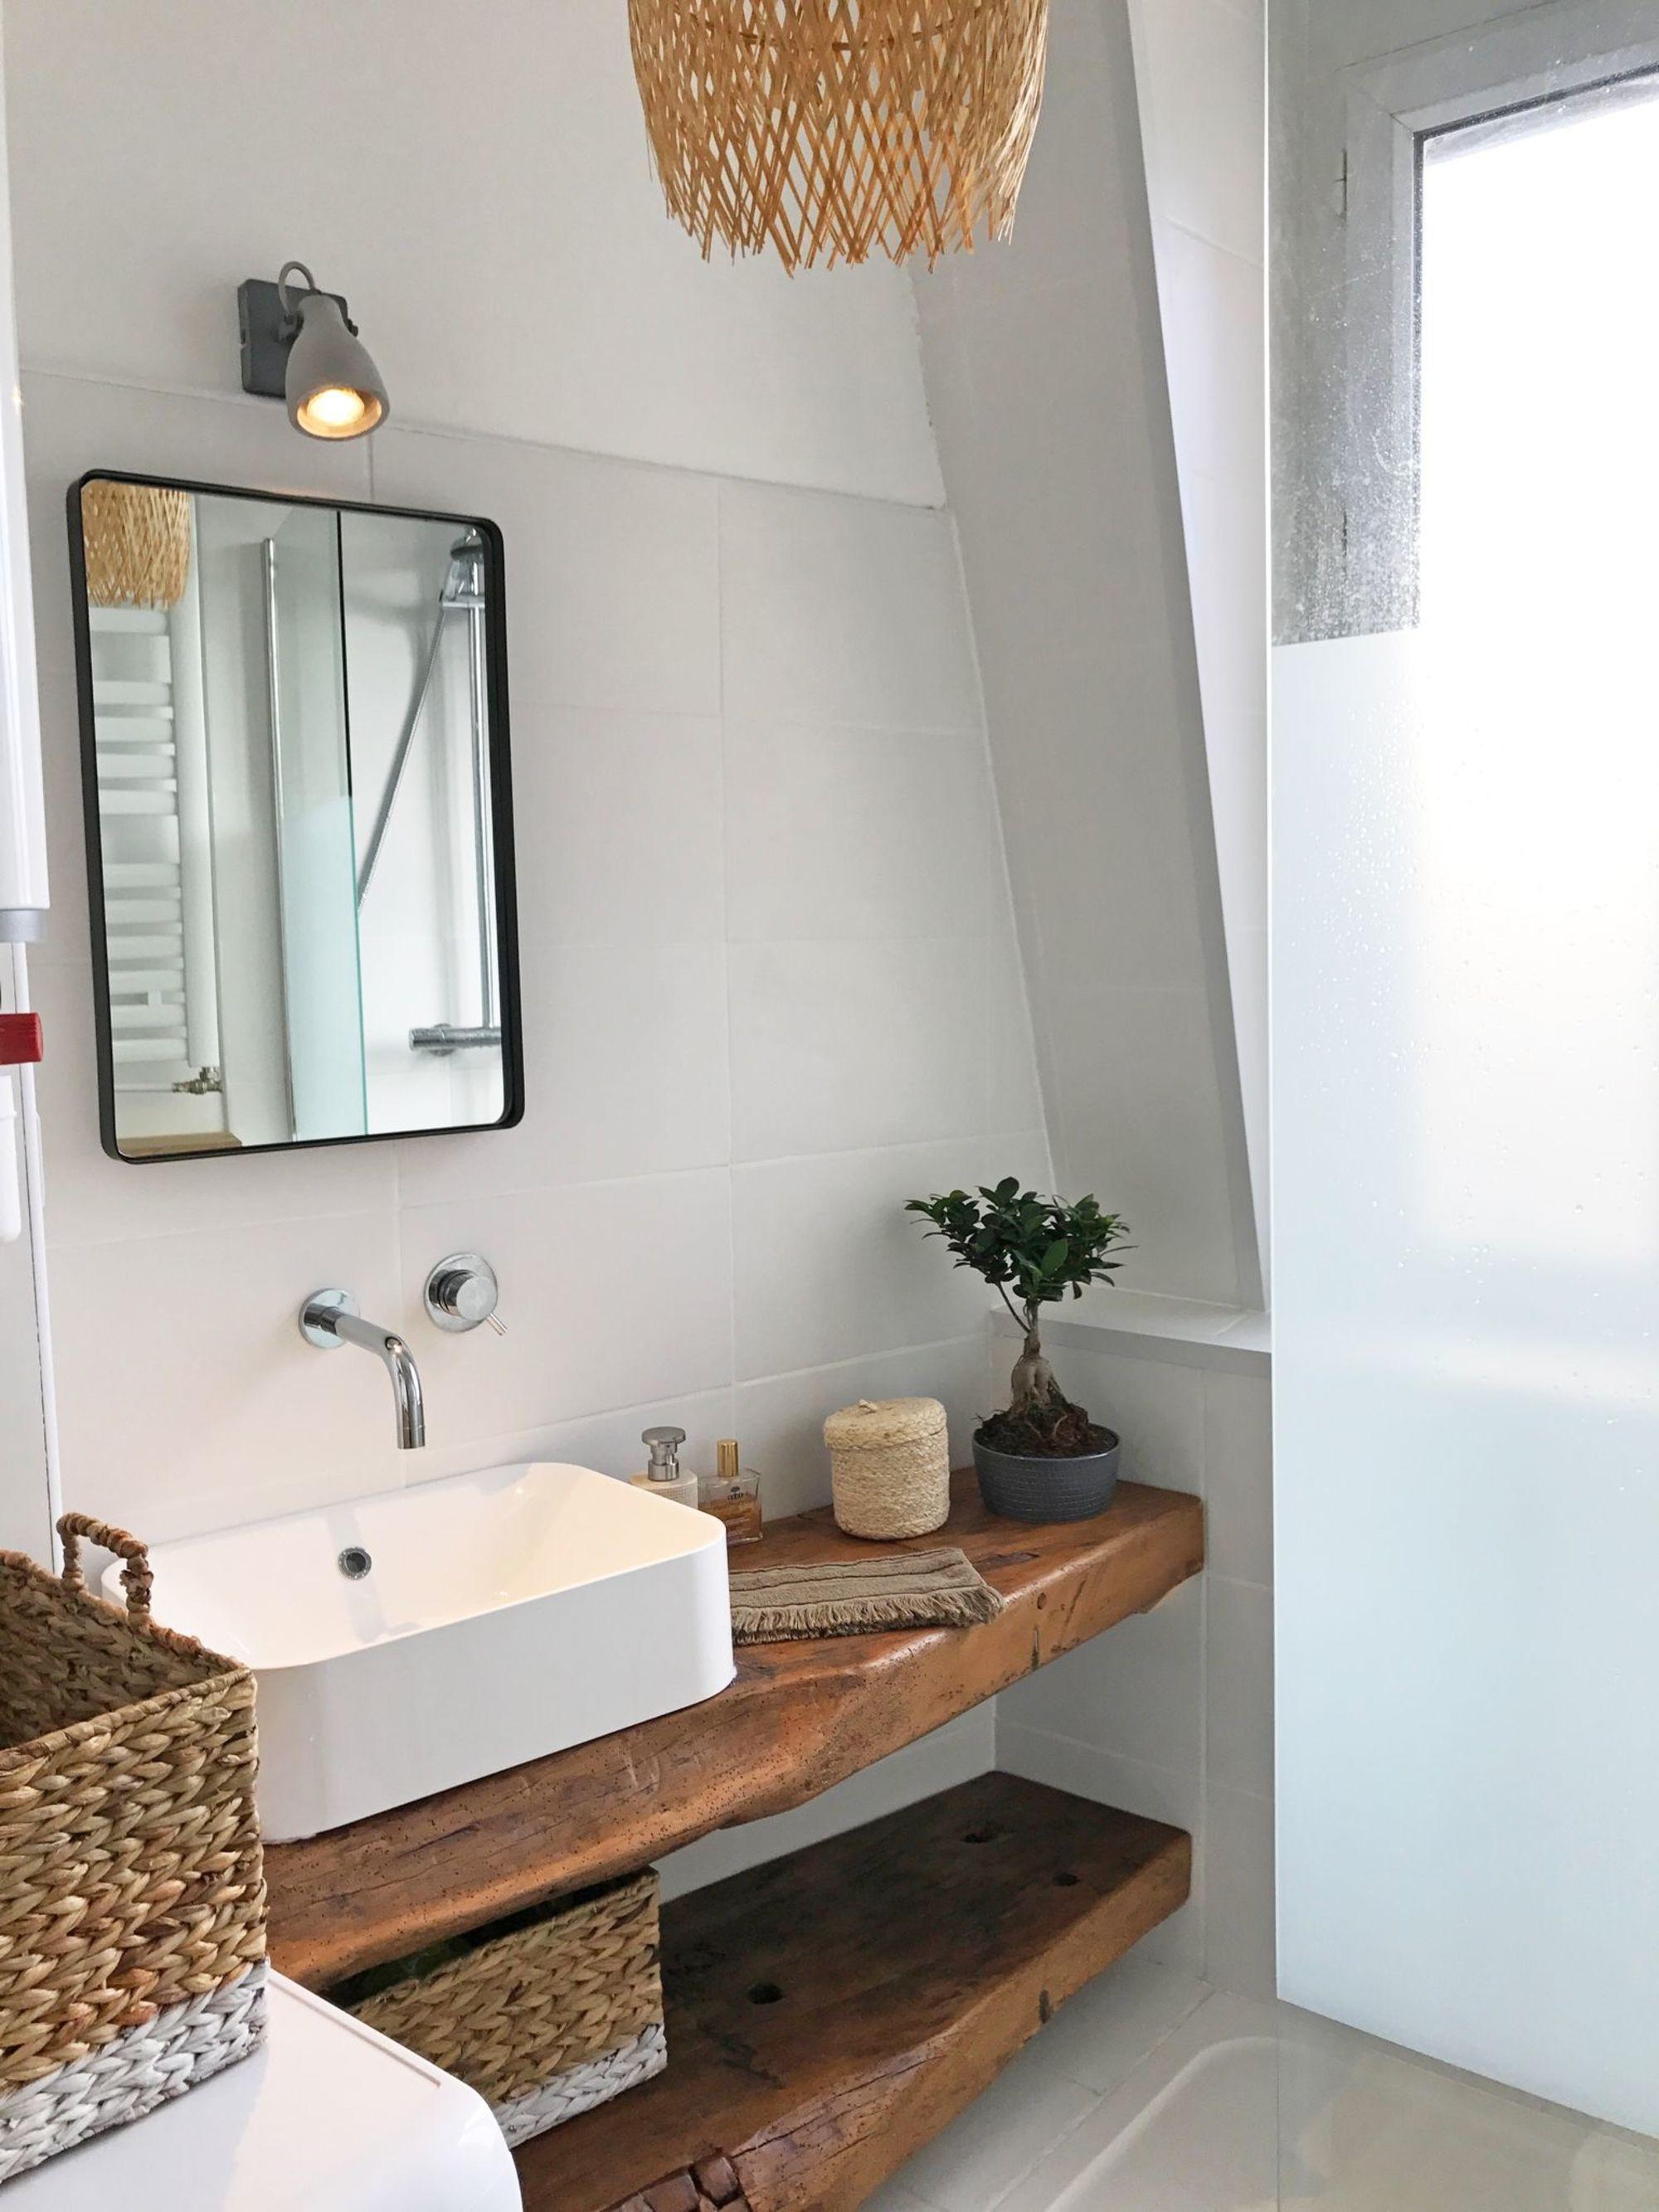 Renovation Petite Salle De Bains De 3 M2 Small Bathroom Bathroom Mirror Frame Bathroom